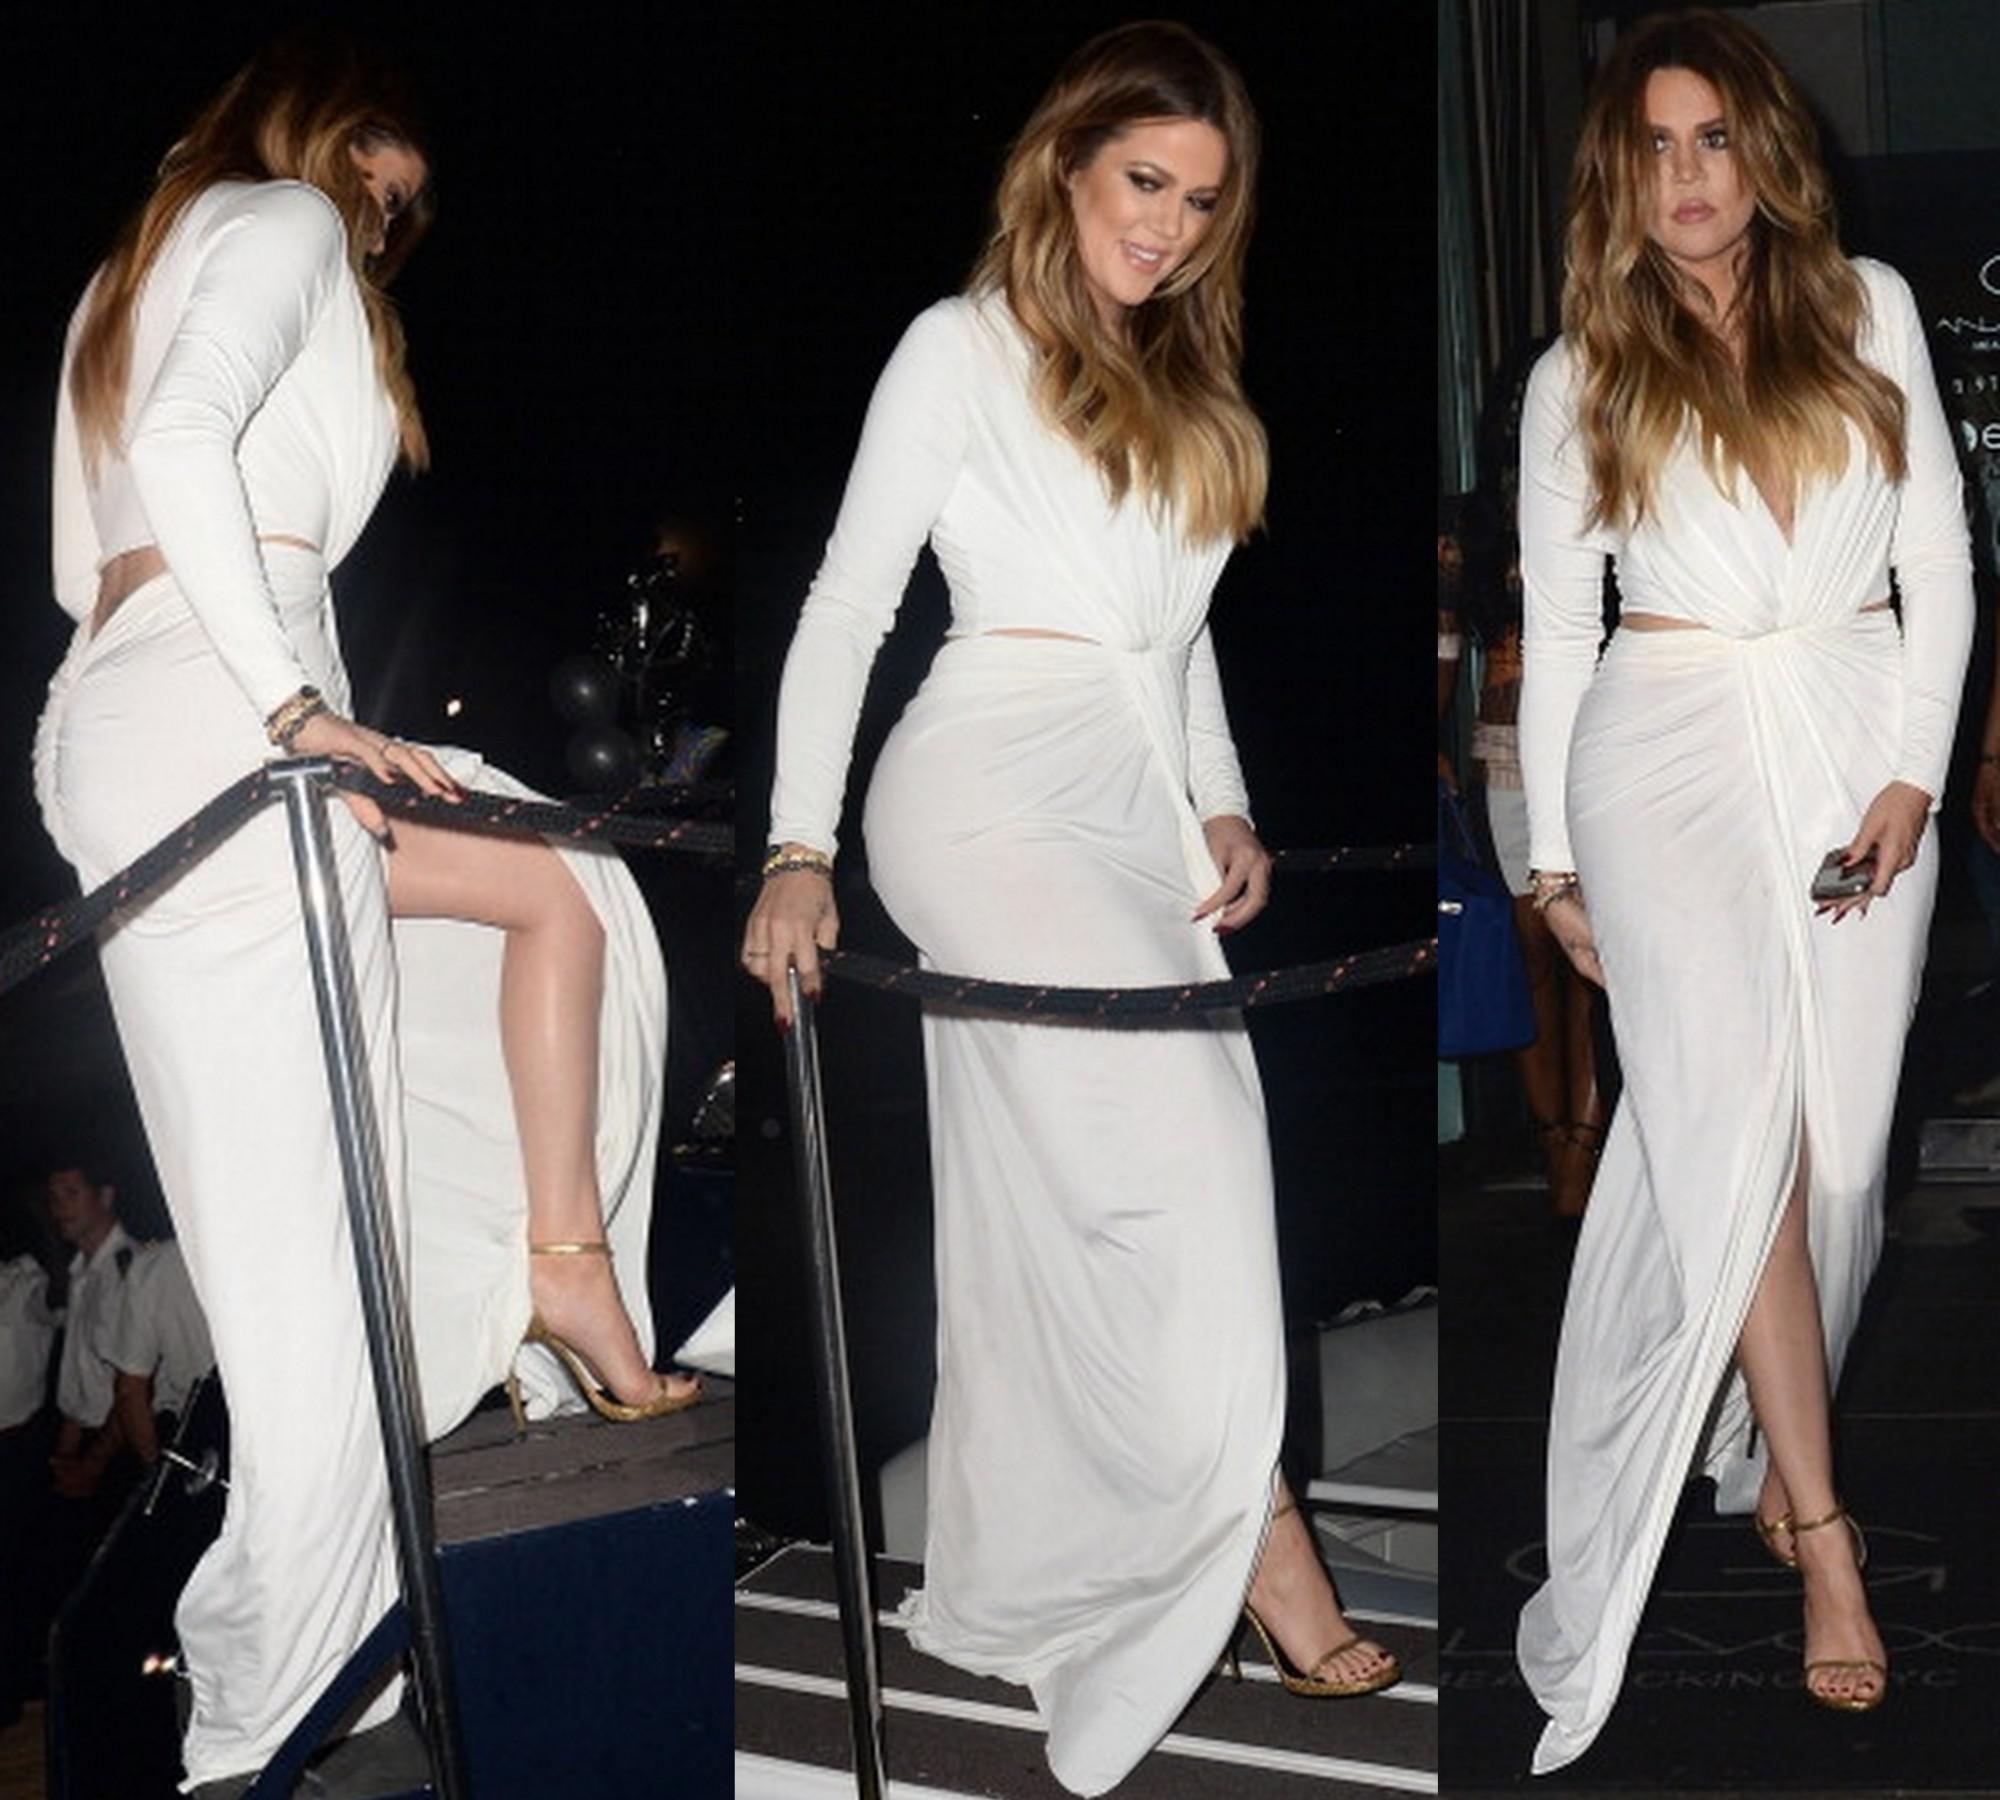 Jersey maxi evening dresses